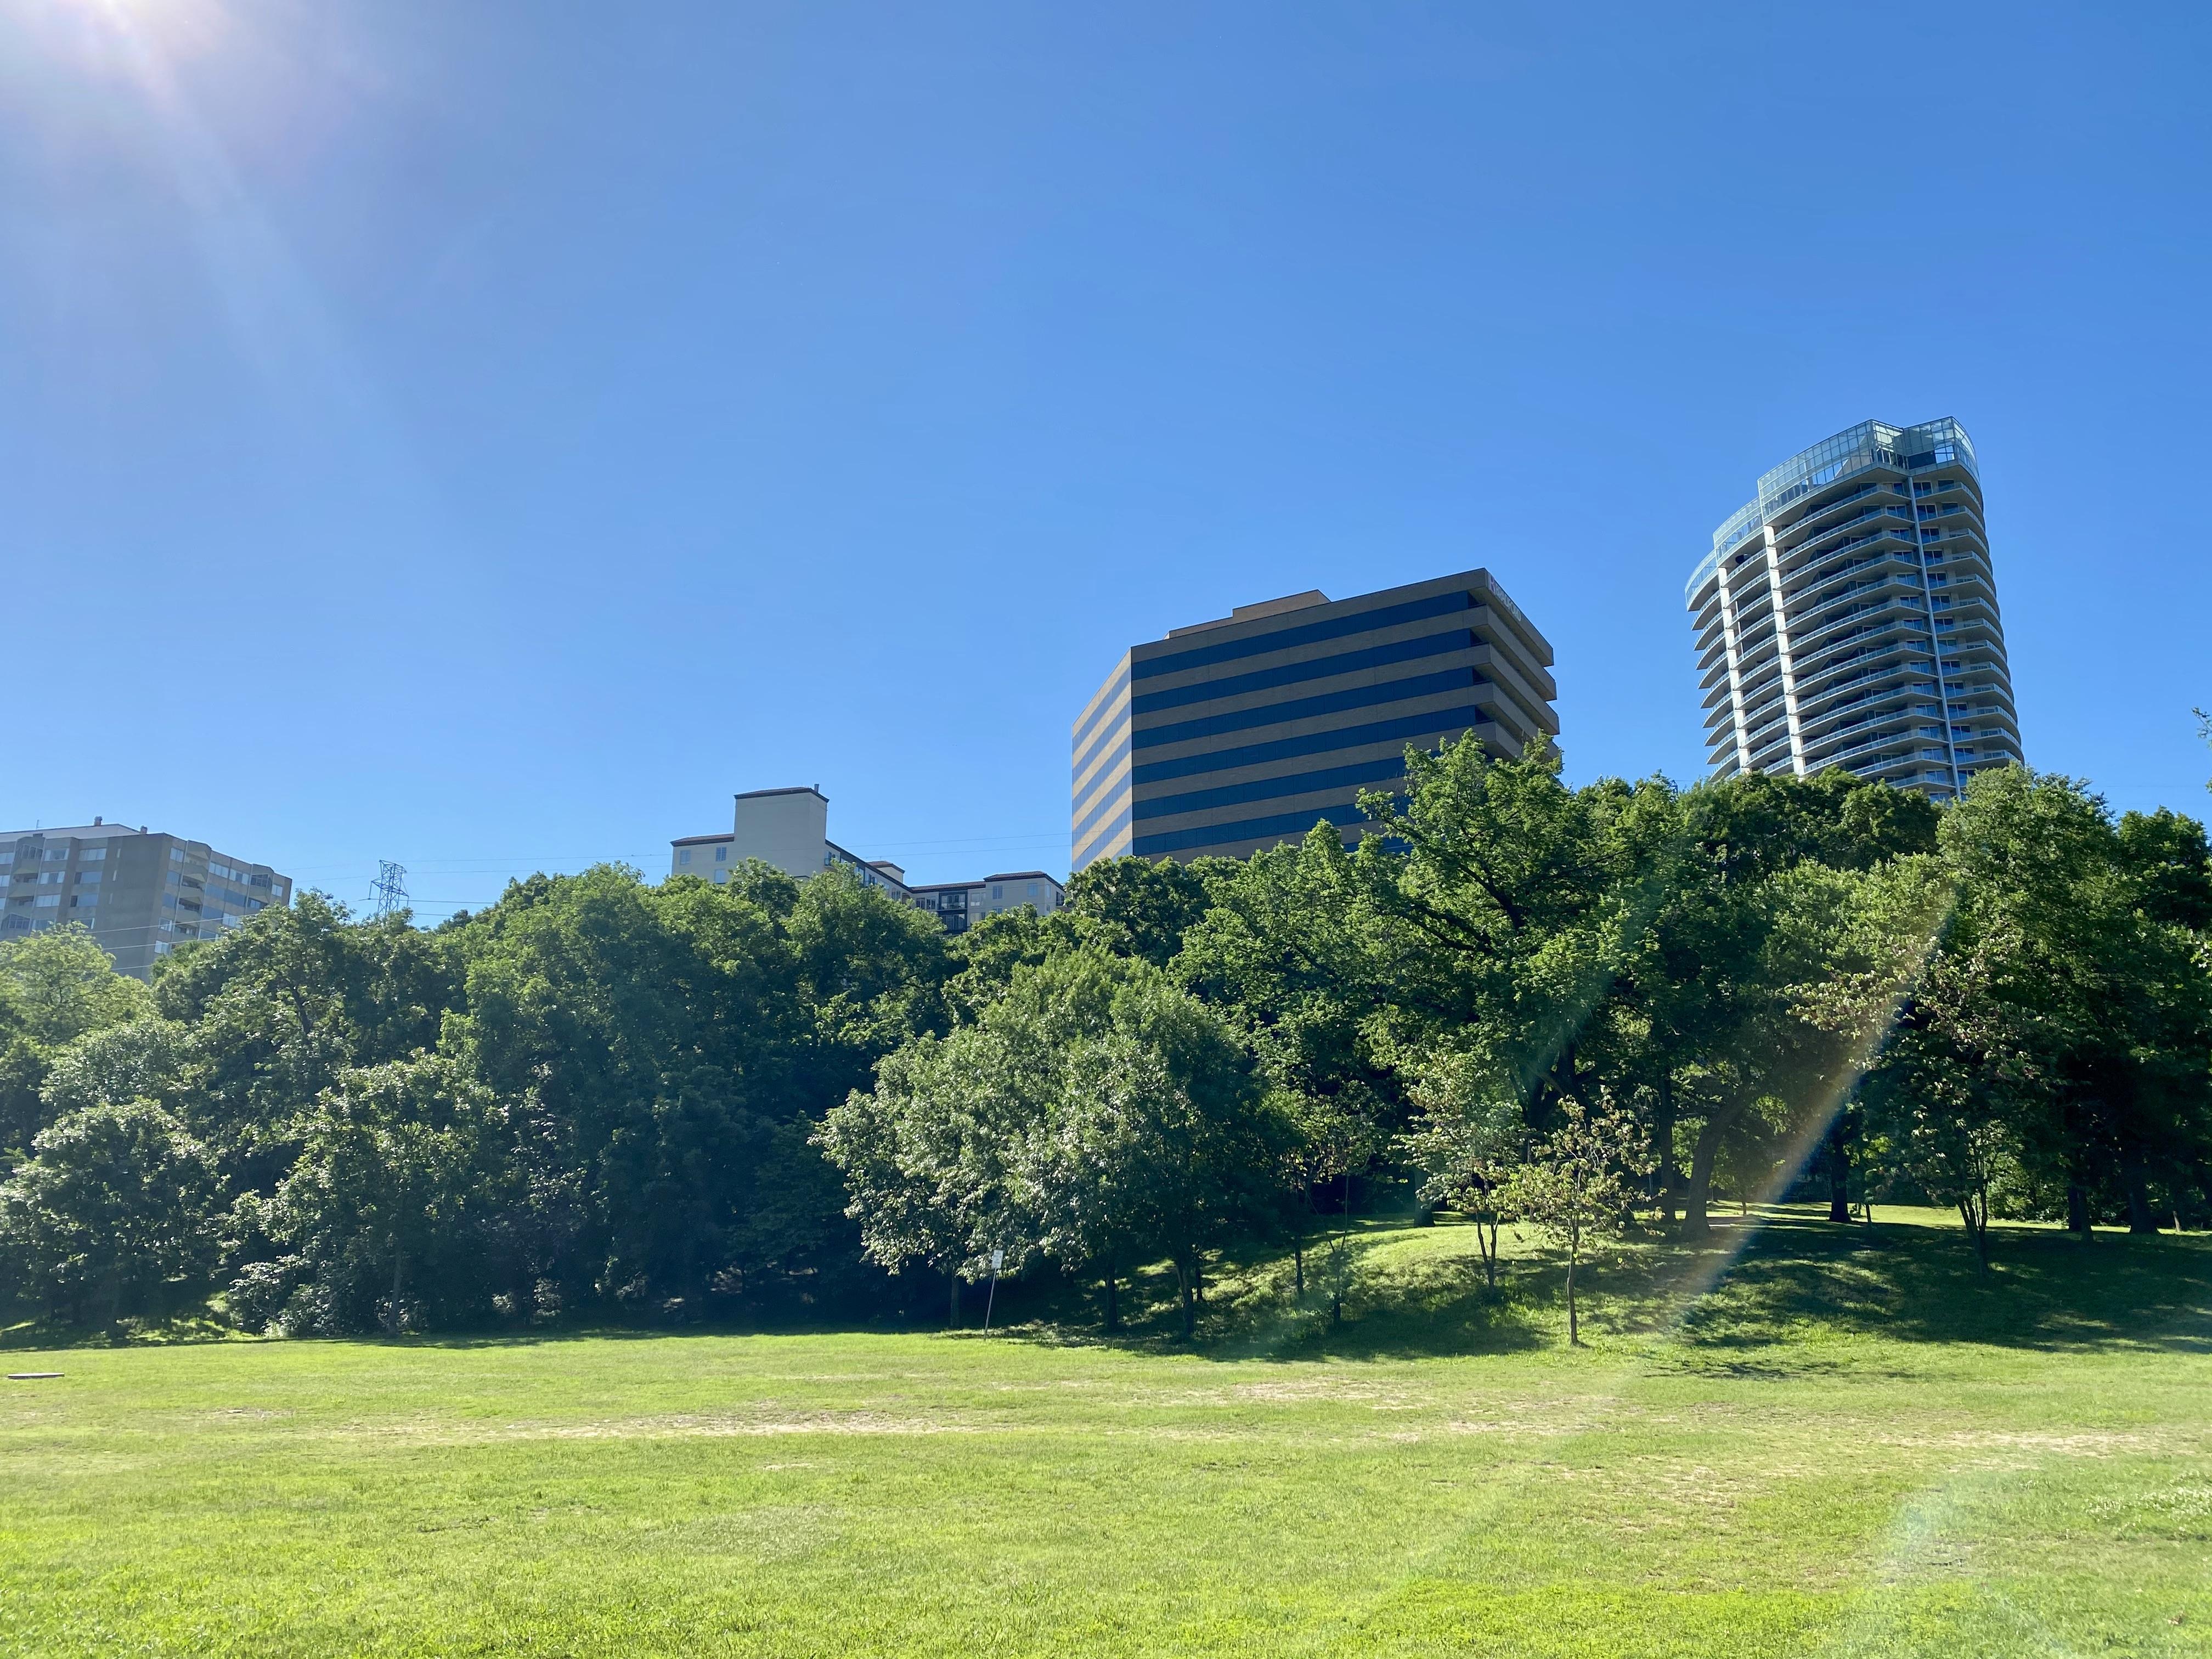 Reverchon Park and Uptown Highrises